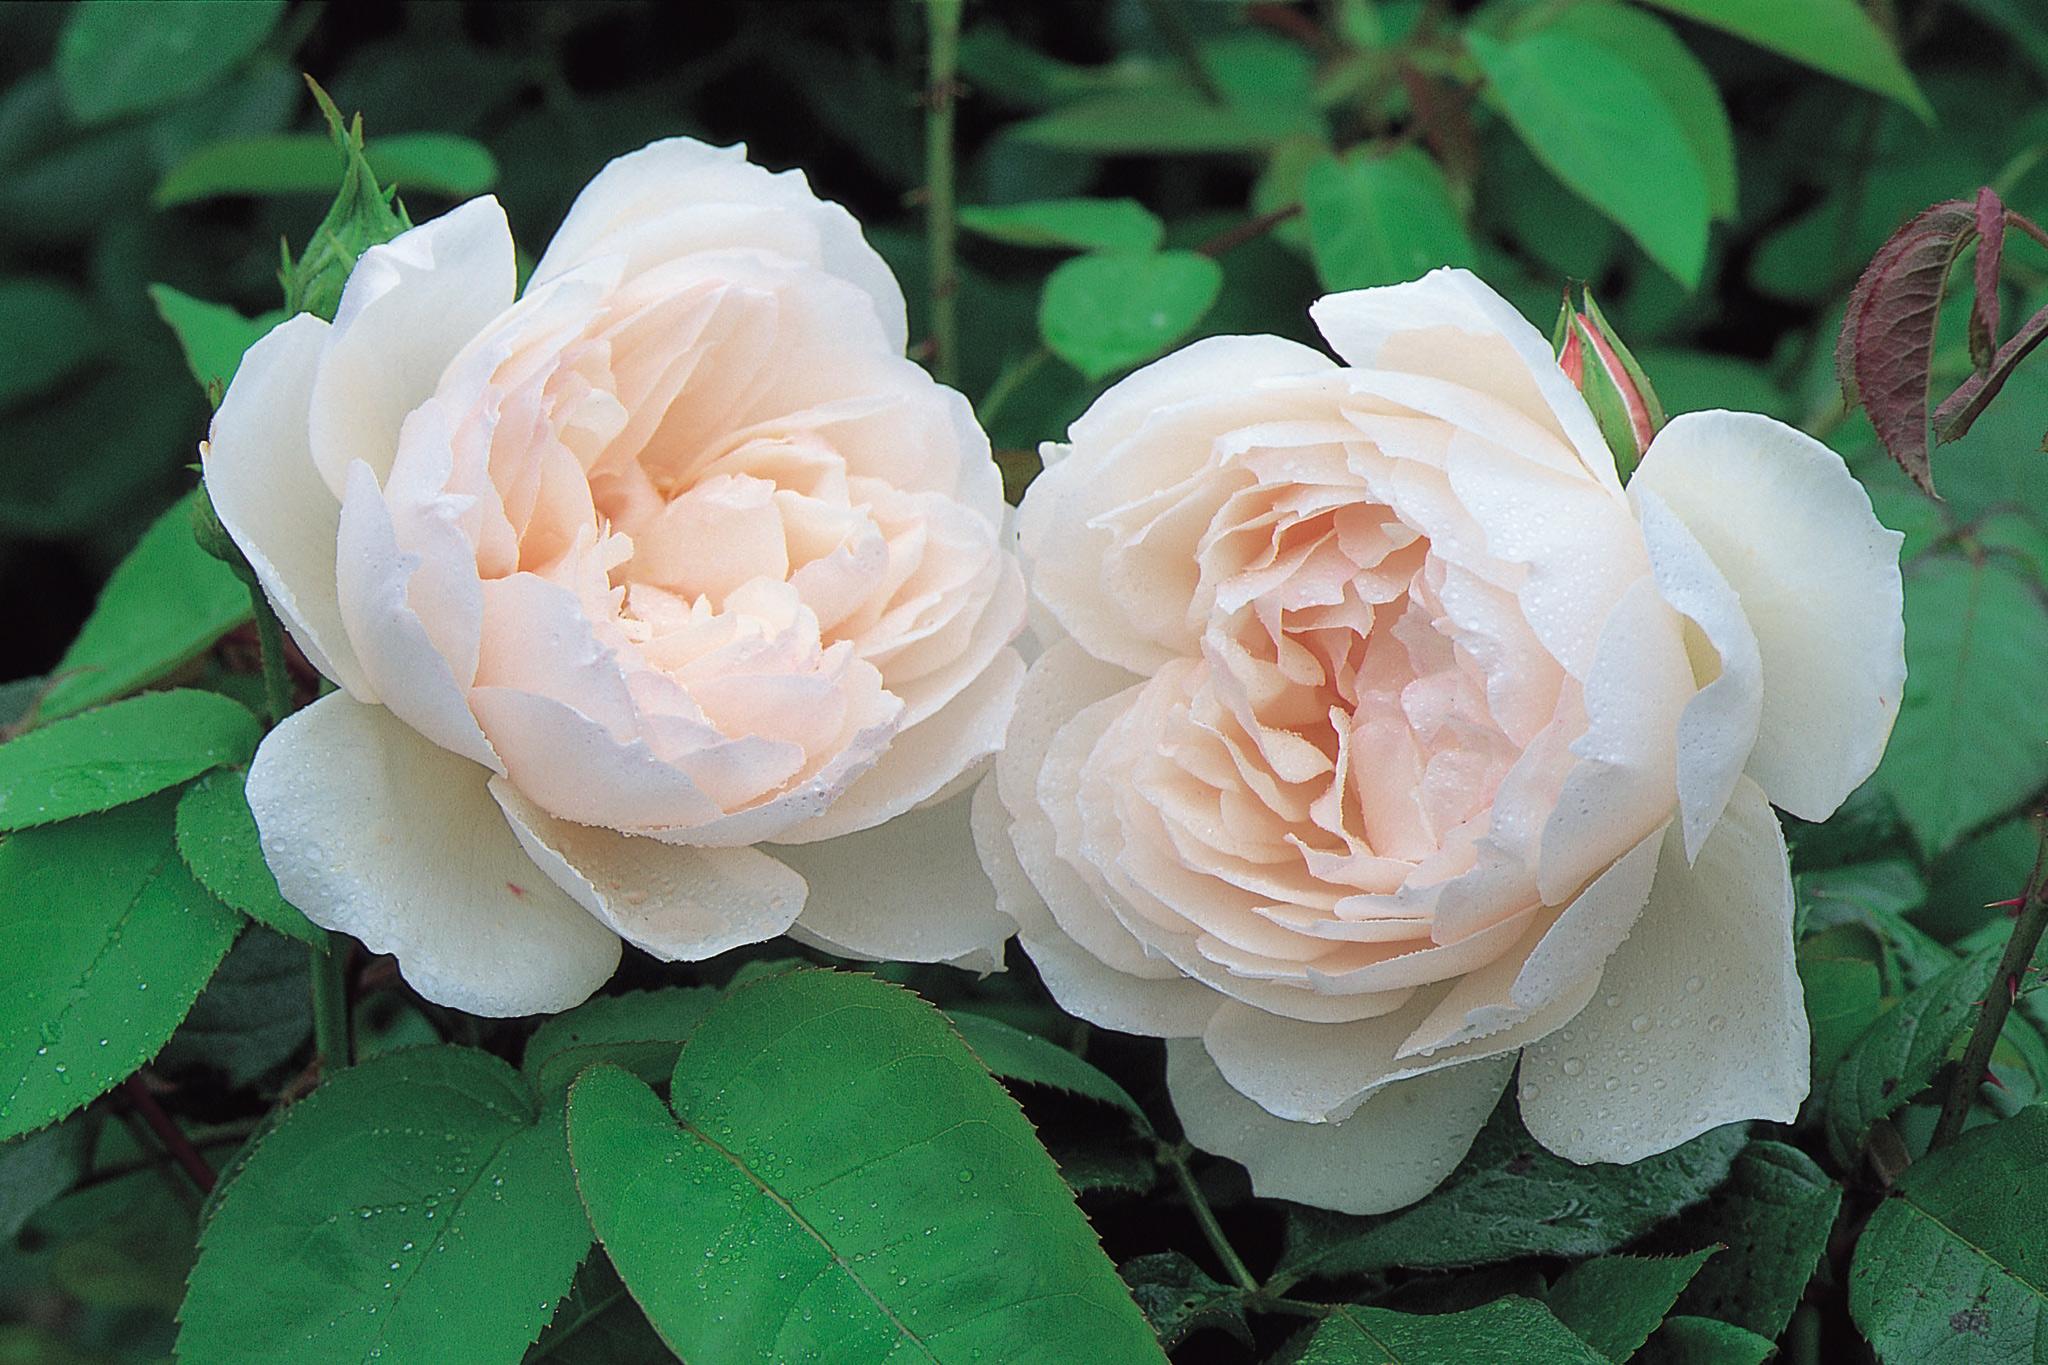 rosa-the-generous-gardener-image-courtesy-of-david-austin-roses-2